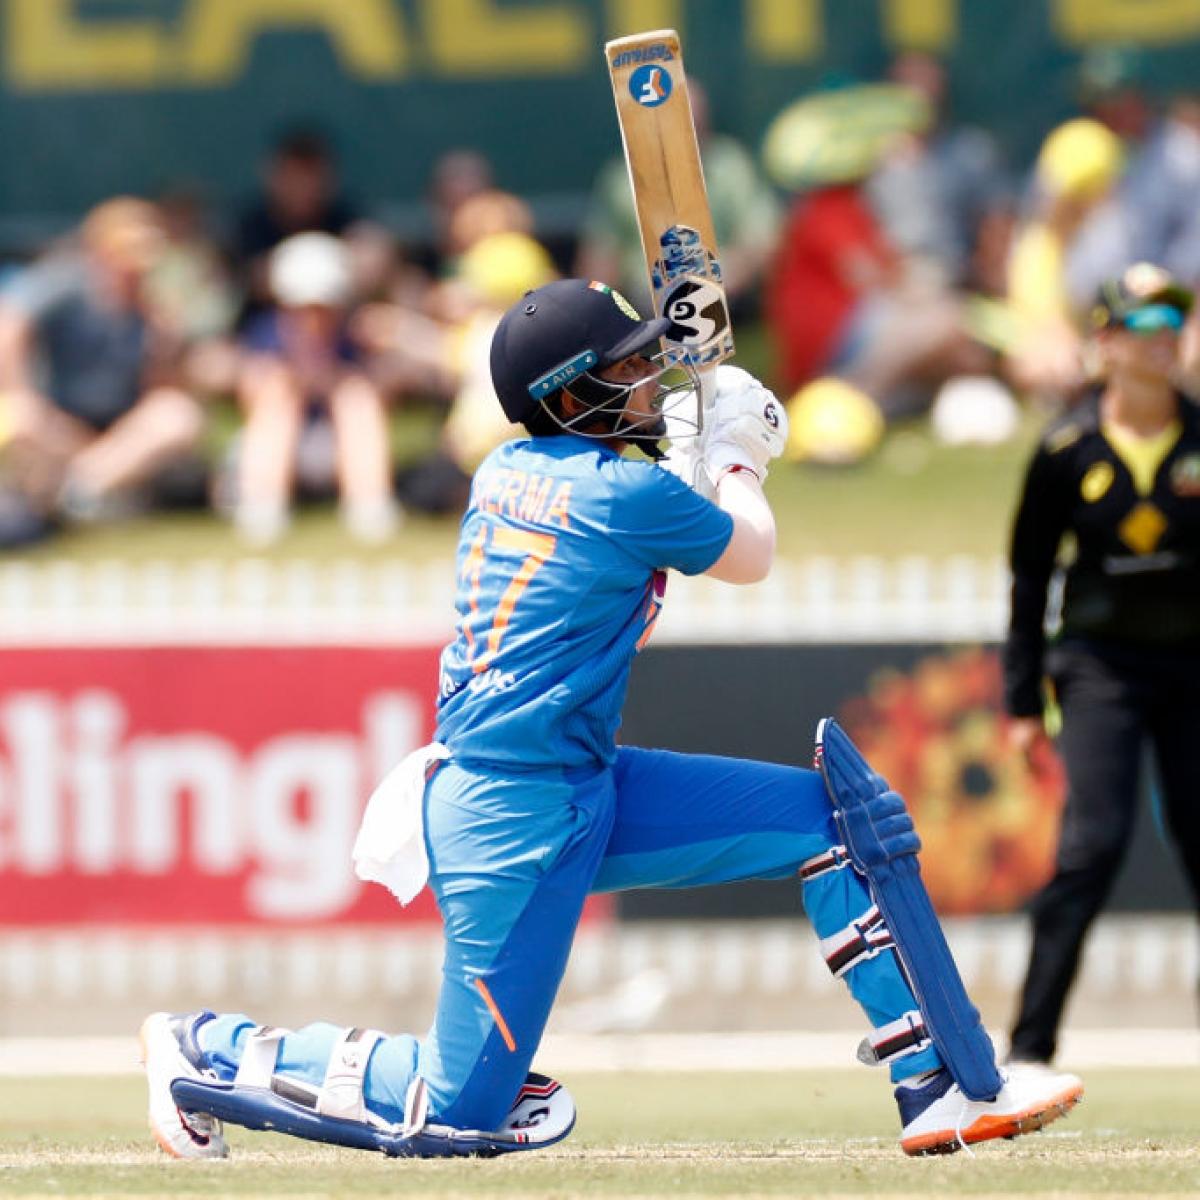 India vs Australia WT20I: Shafali Varma's pyrotechnics helps team chase down highest T20I target with ease